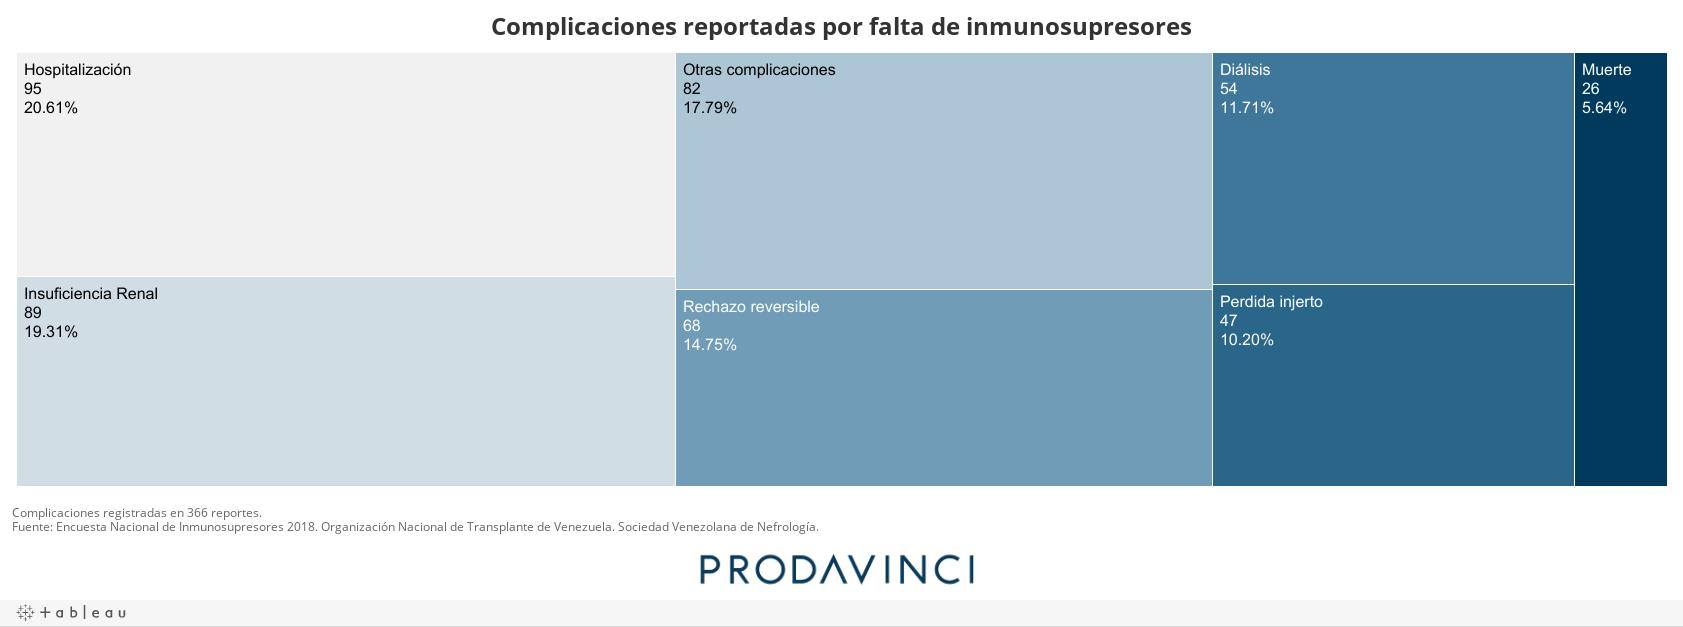 Complicaciones reportadas por falta de inmunosupresores